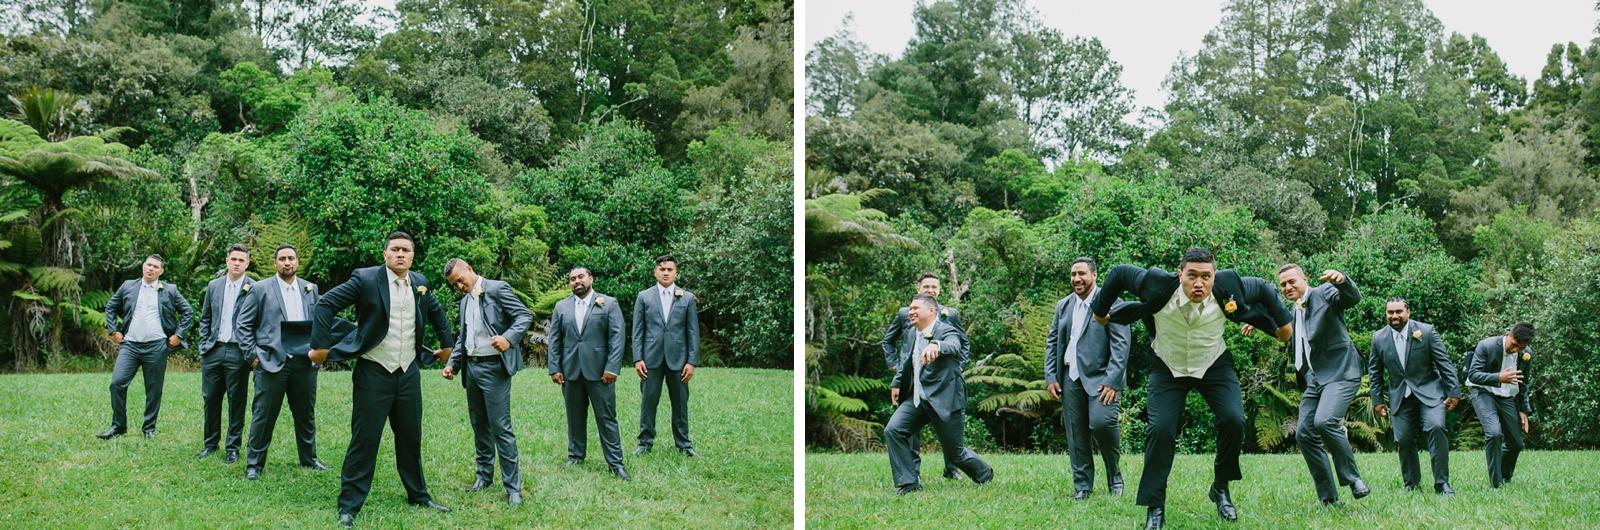 GabbyFiti_Auckland Wedding Photographer_Patty Lagera_0064.jpg